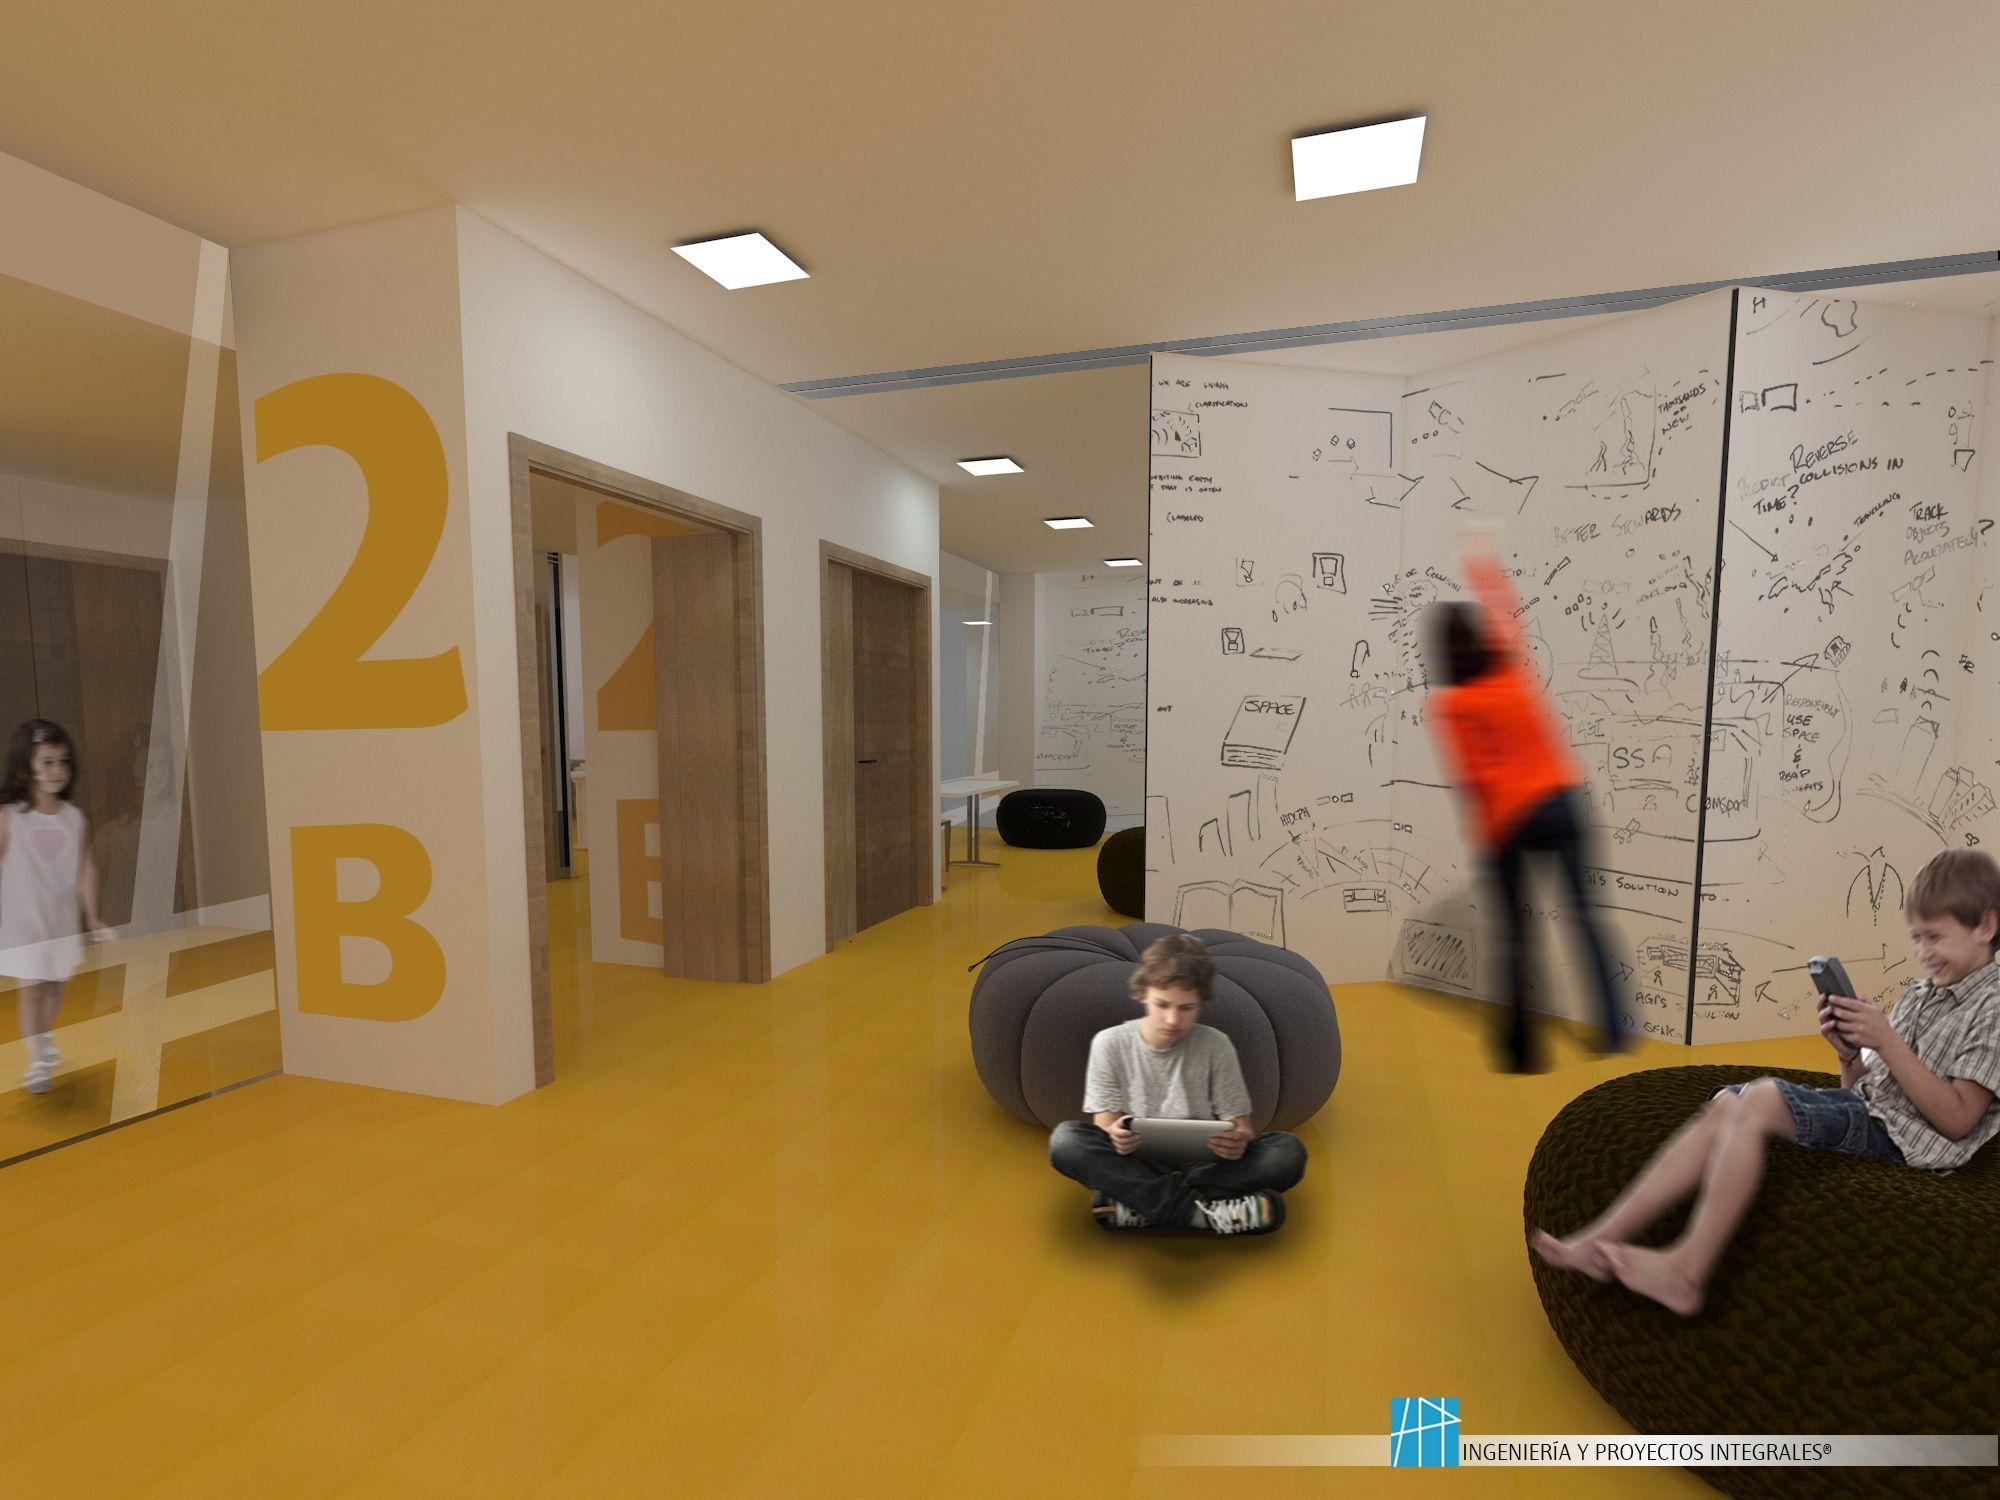 Aulas primaria tabiques m viles ingenier a y proyectos integrales pinterest interior - Tabiques moviles vivienda ...